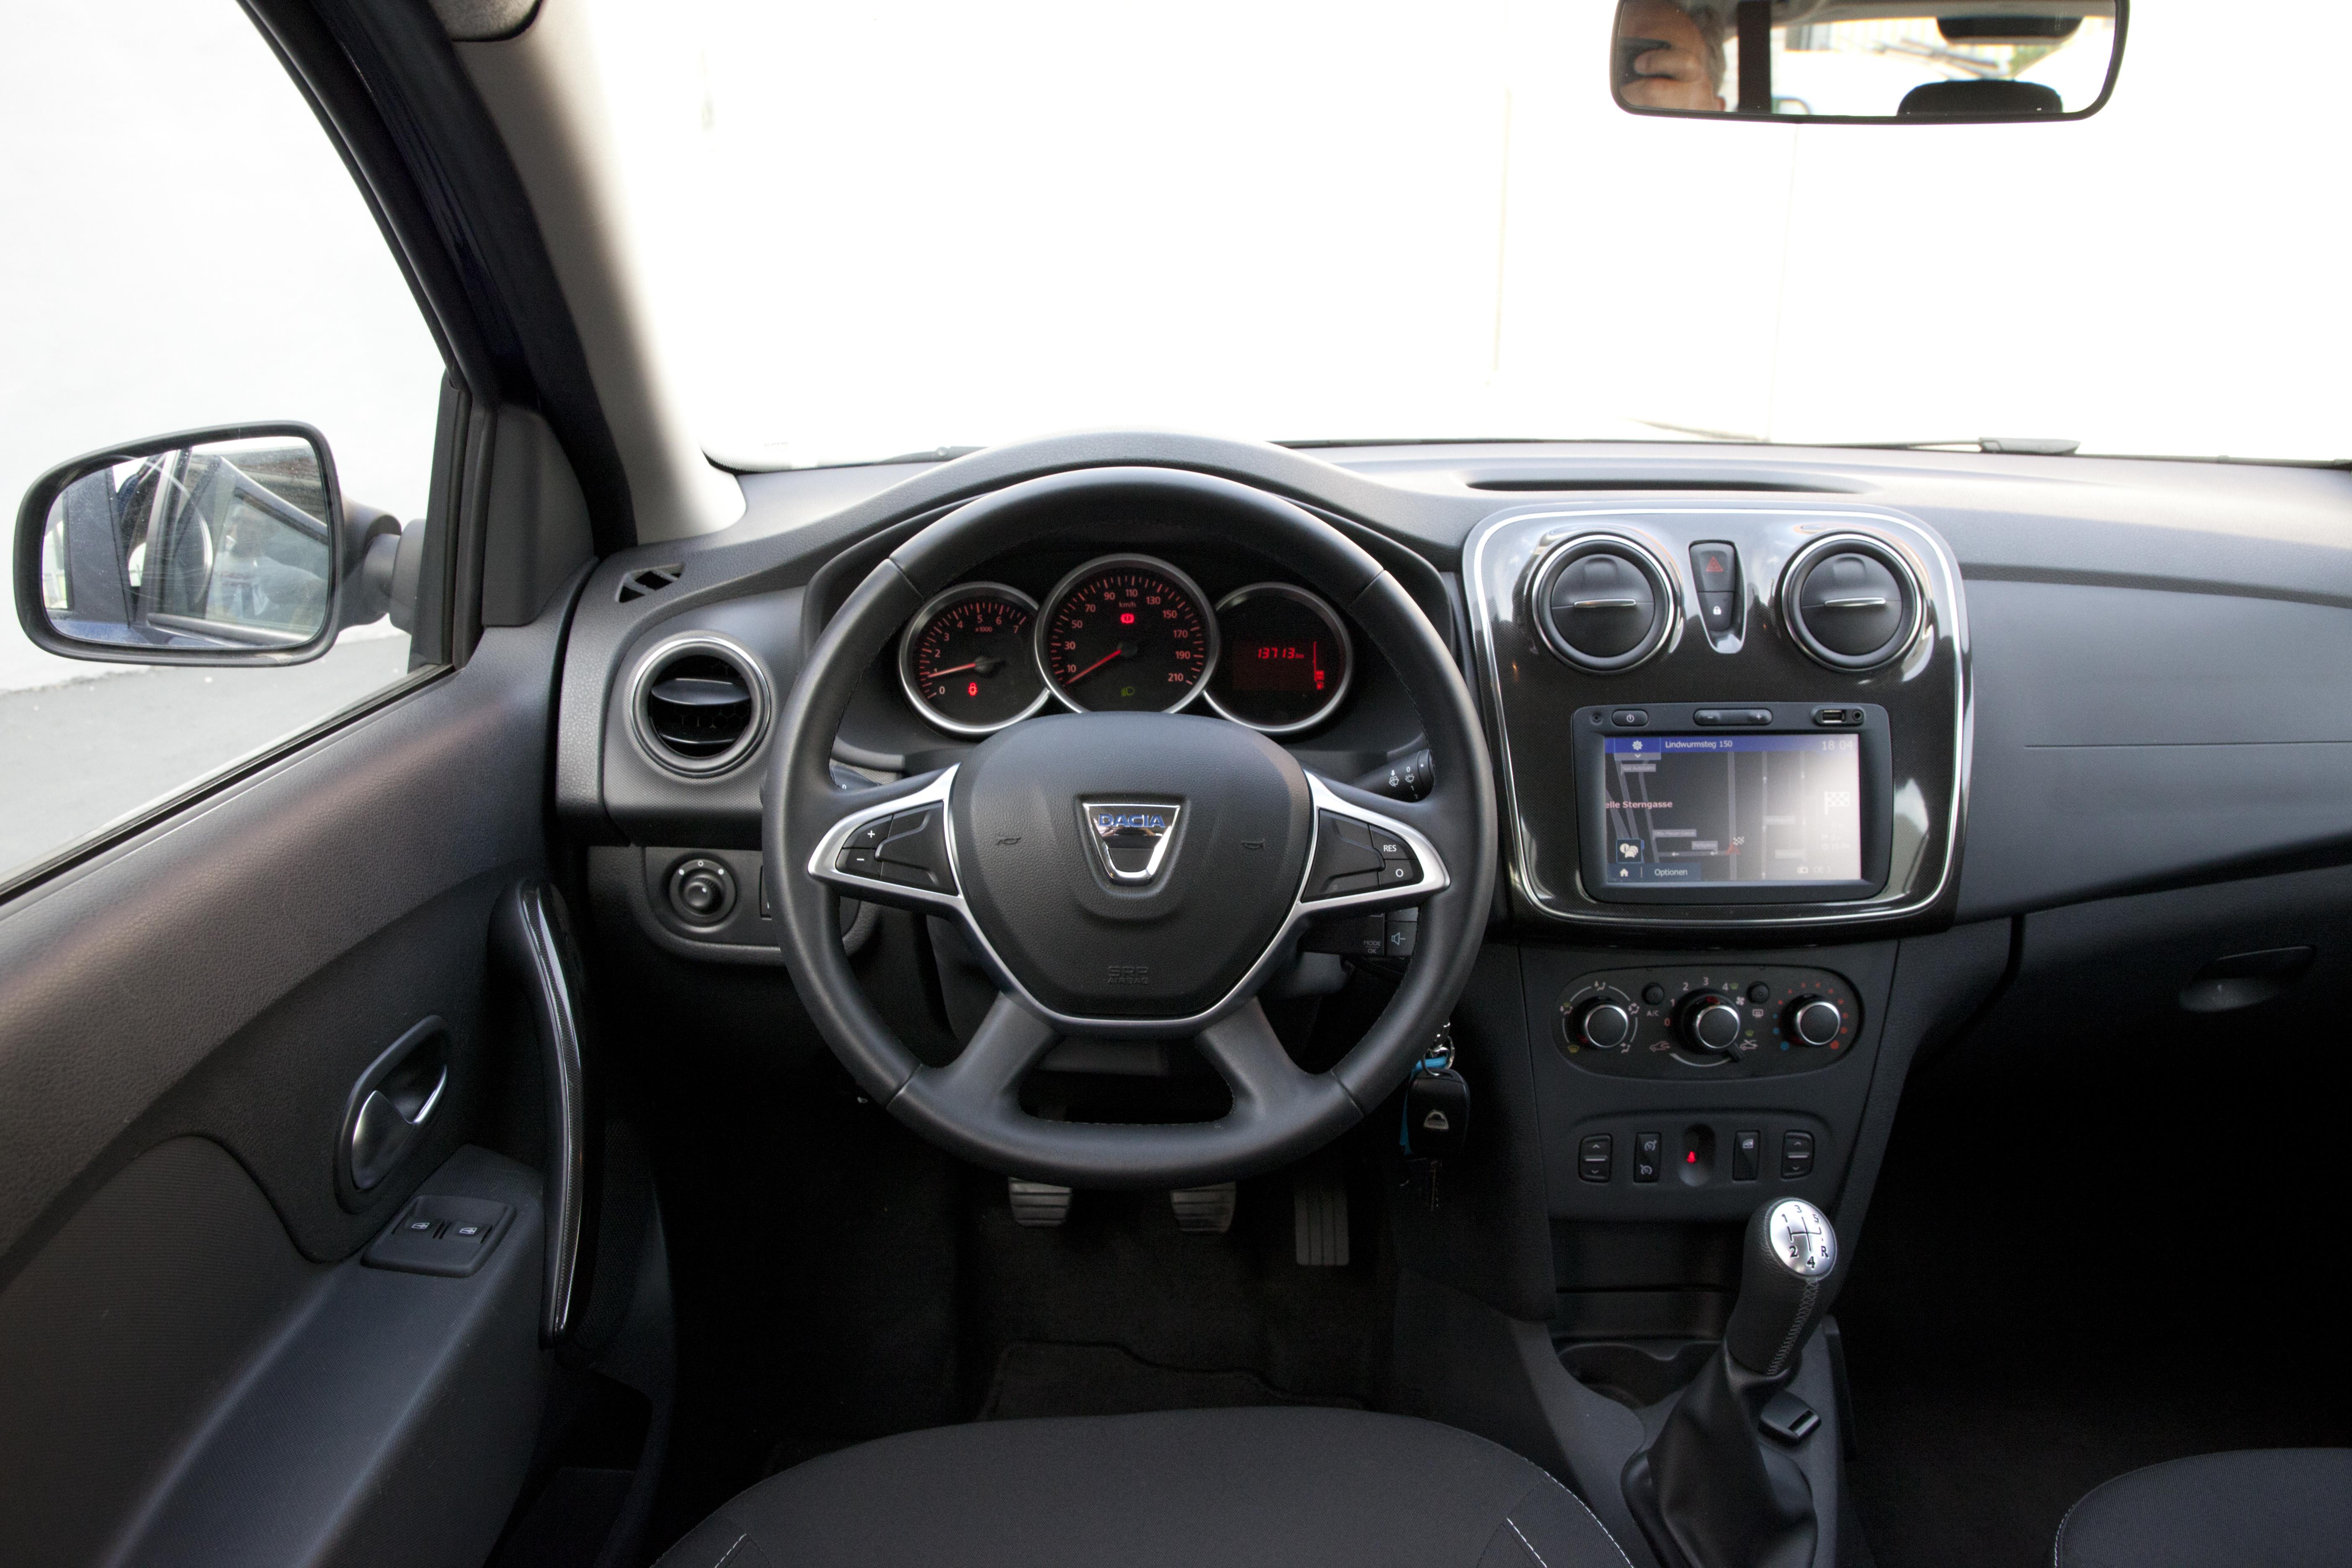 Dacia Logan Original